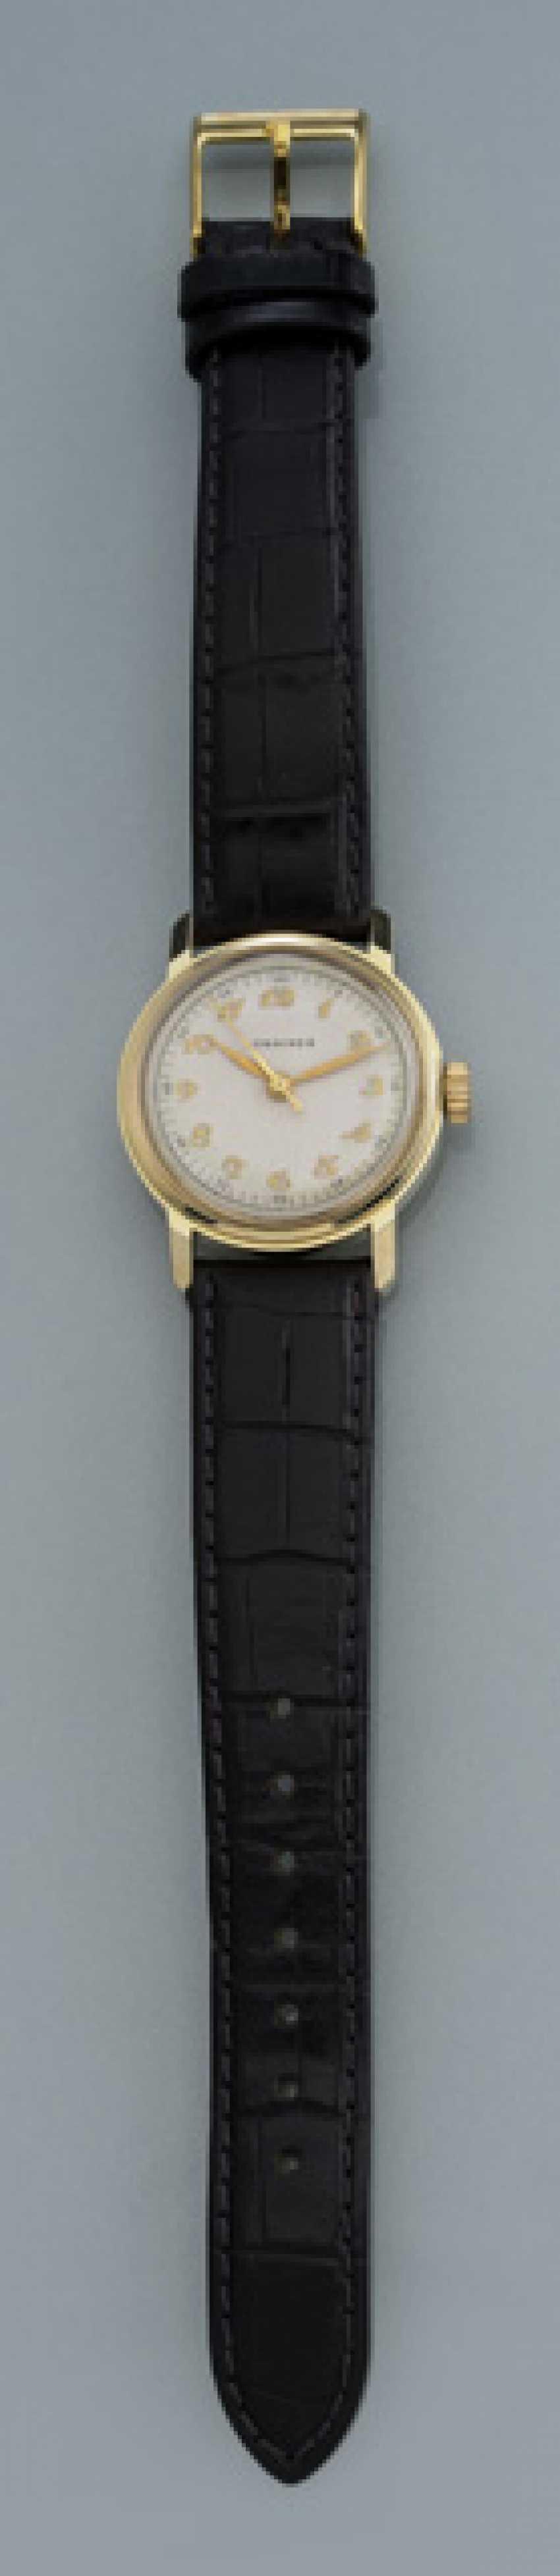 "Longines ""Calatrava"" wristwatch with Breguet numerals made of 10K Gold - photo 1"